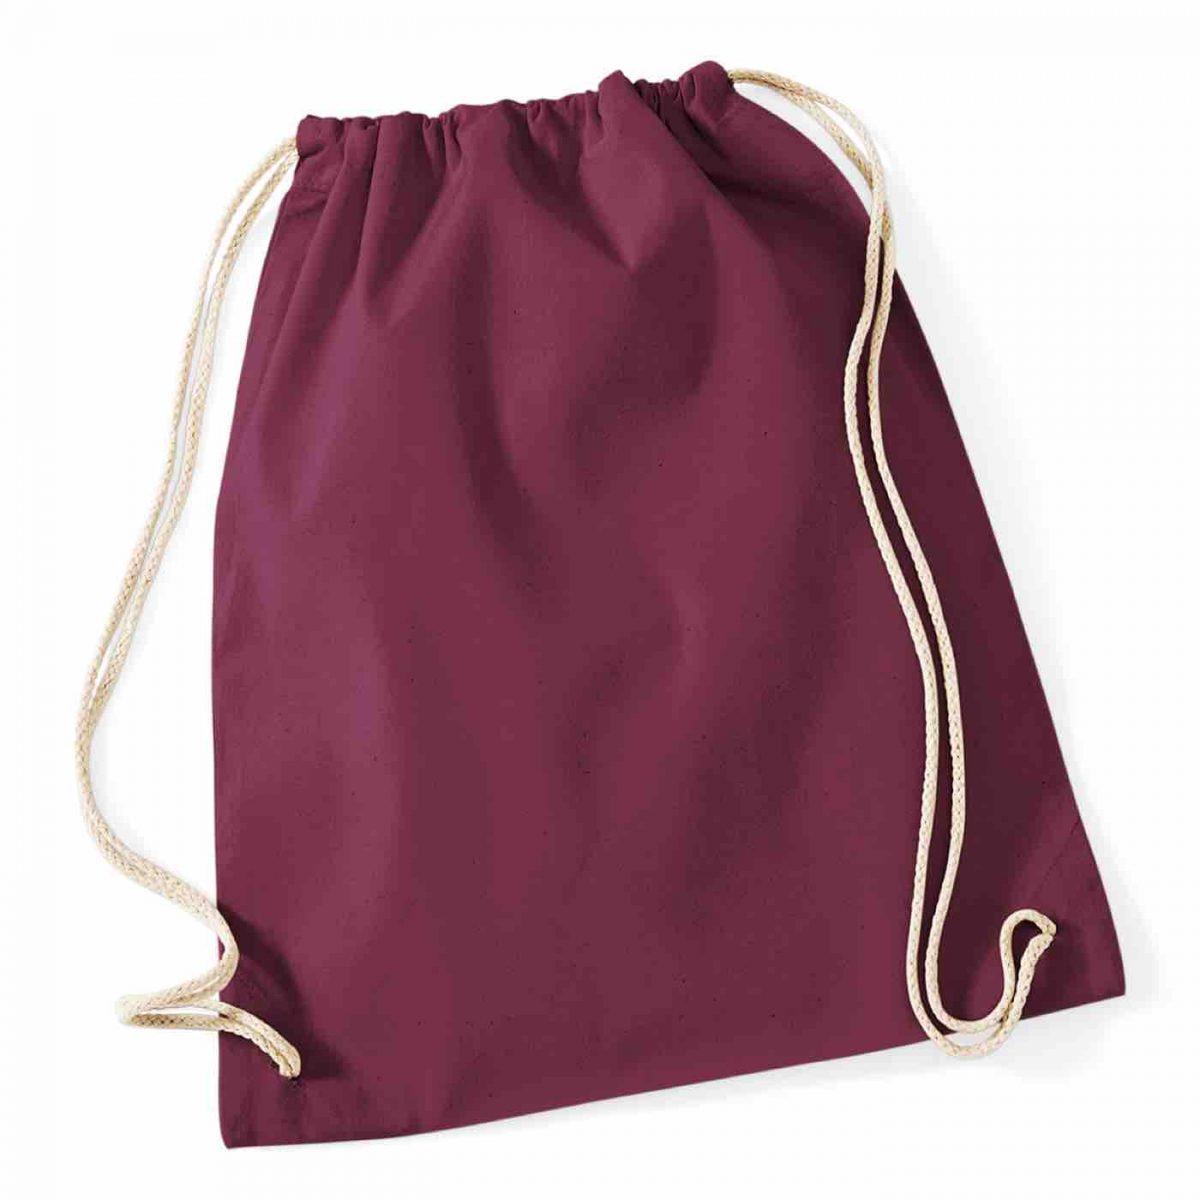 Burgundy Cotton Tote Bag